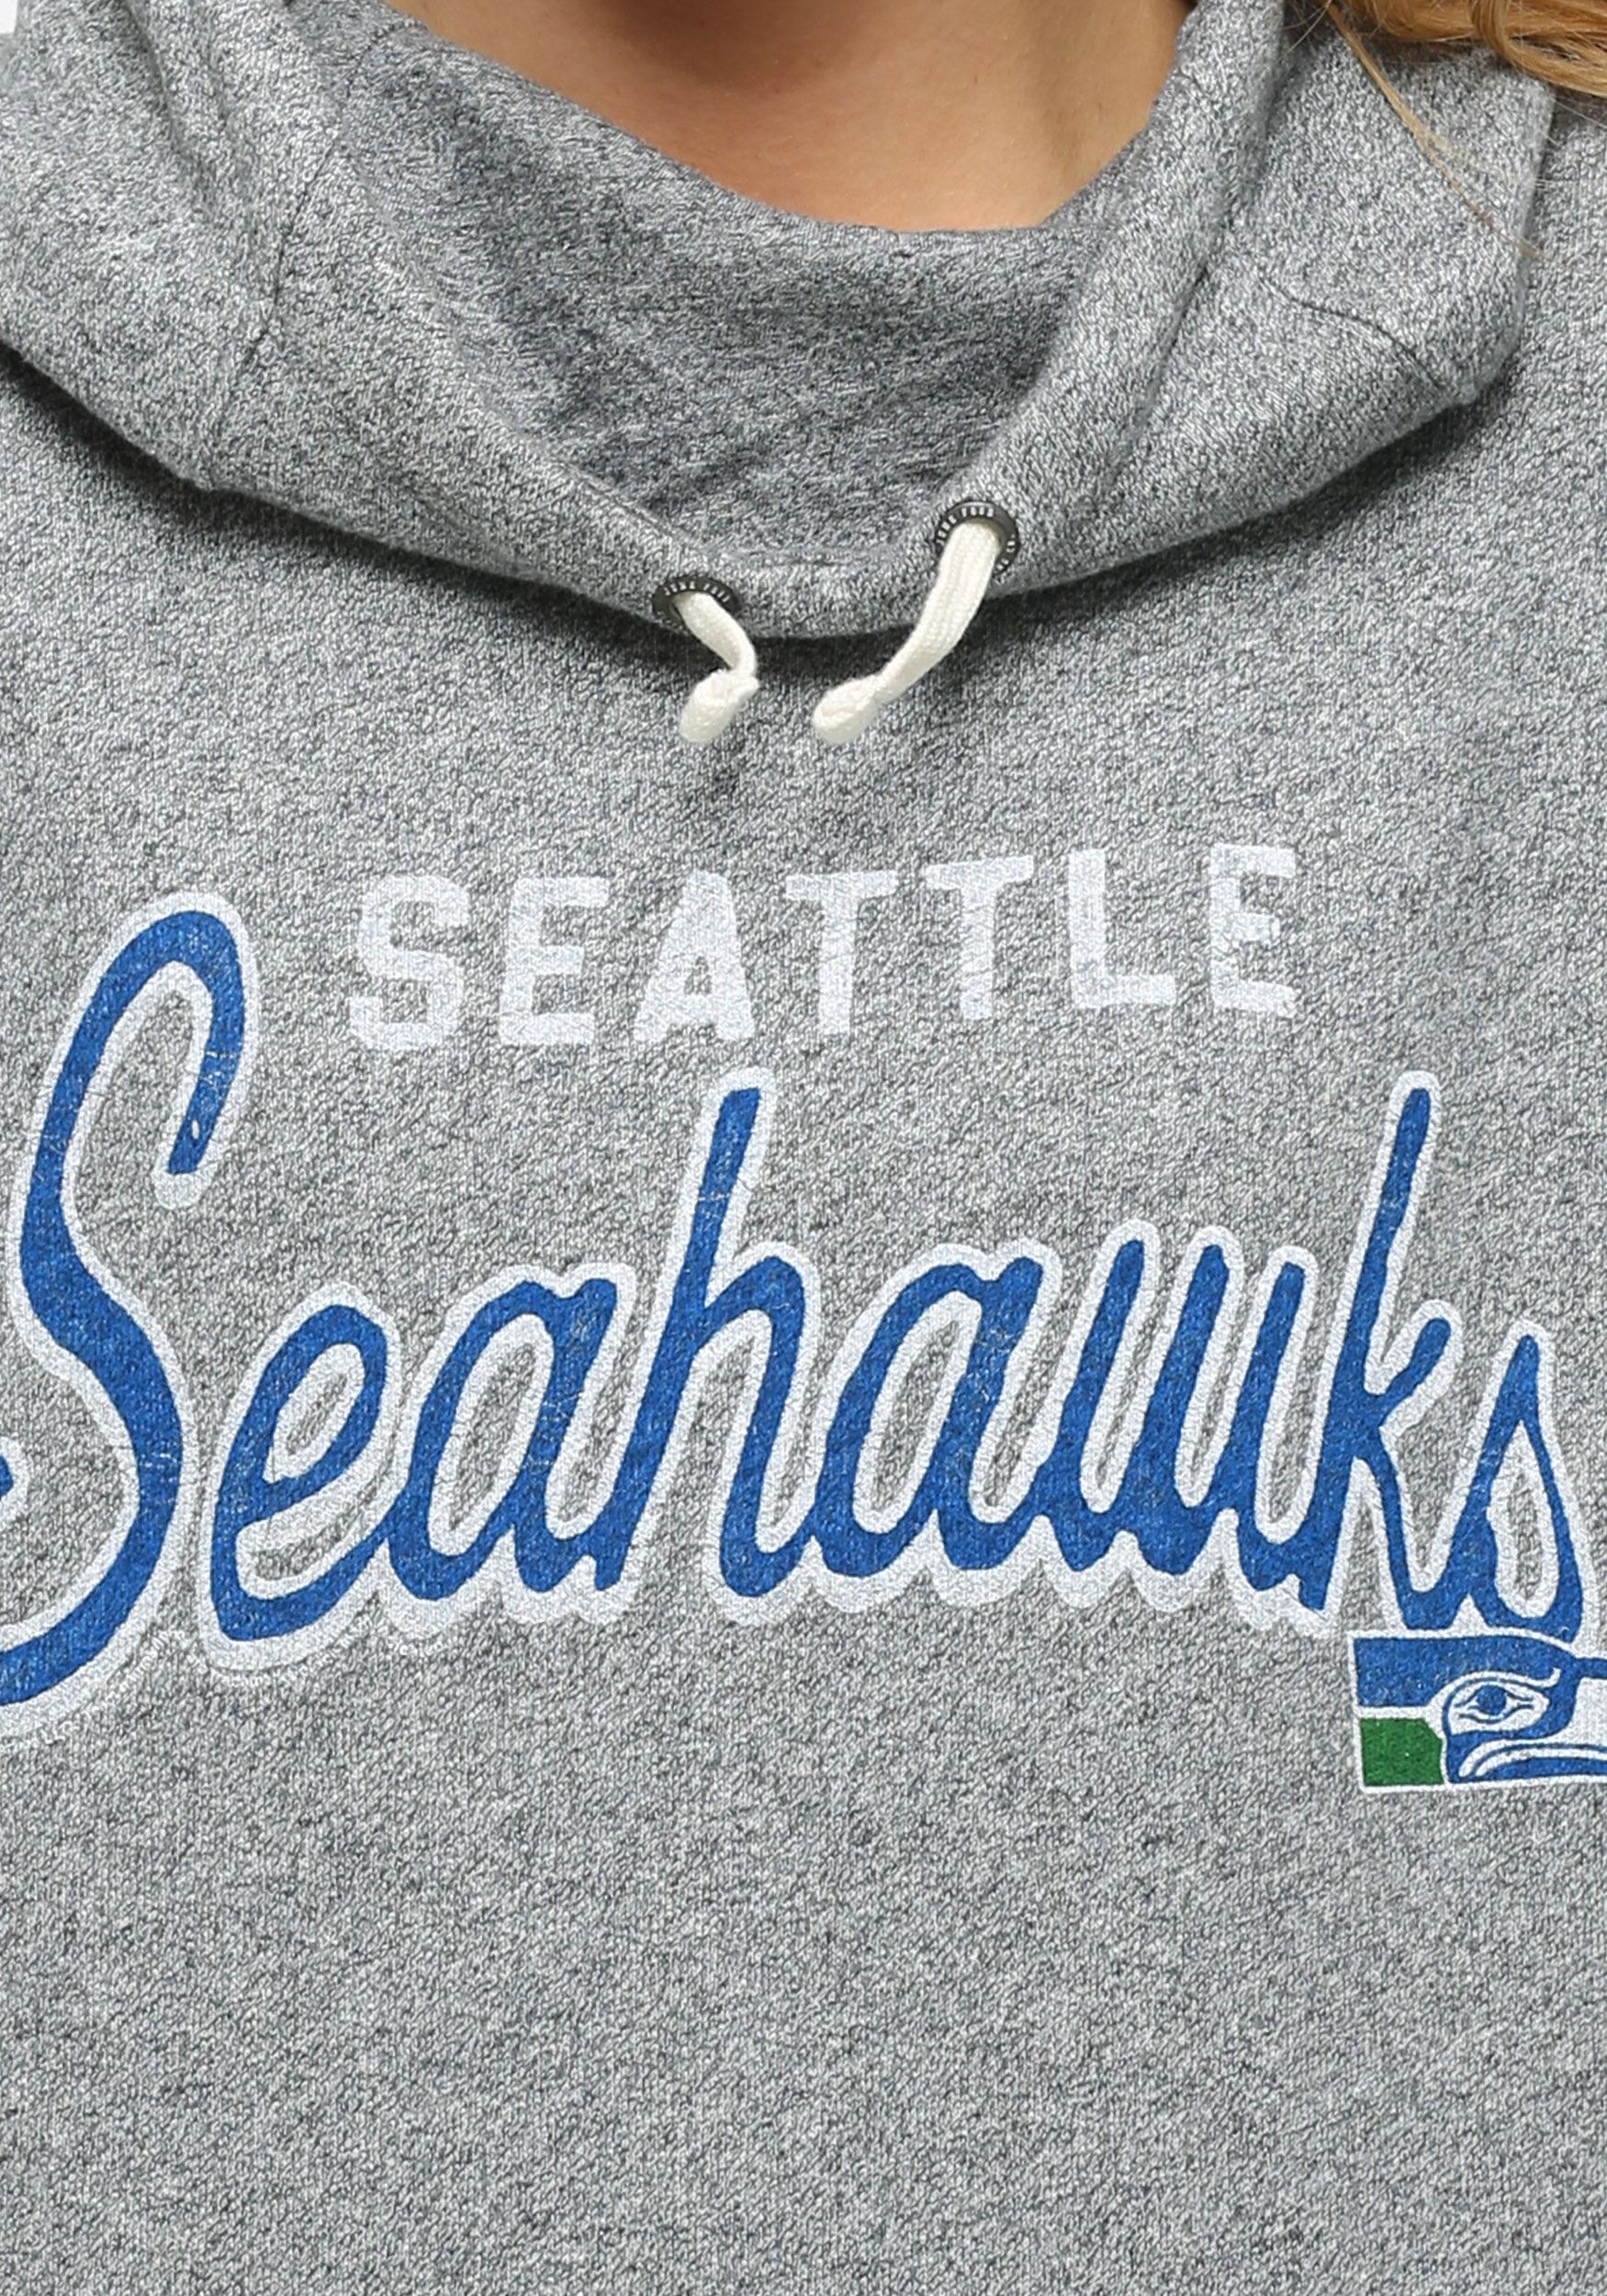 f8c4261d Womens Seattle Seahawks Sunday Cowl Hoodie